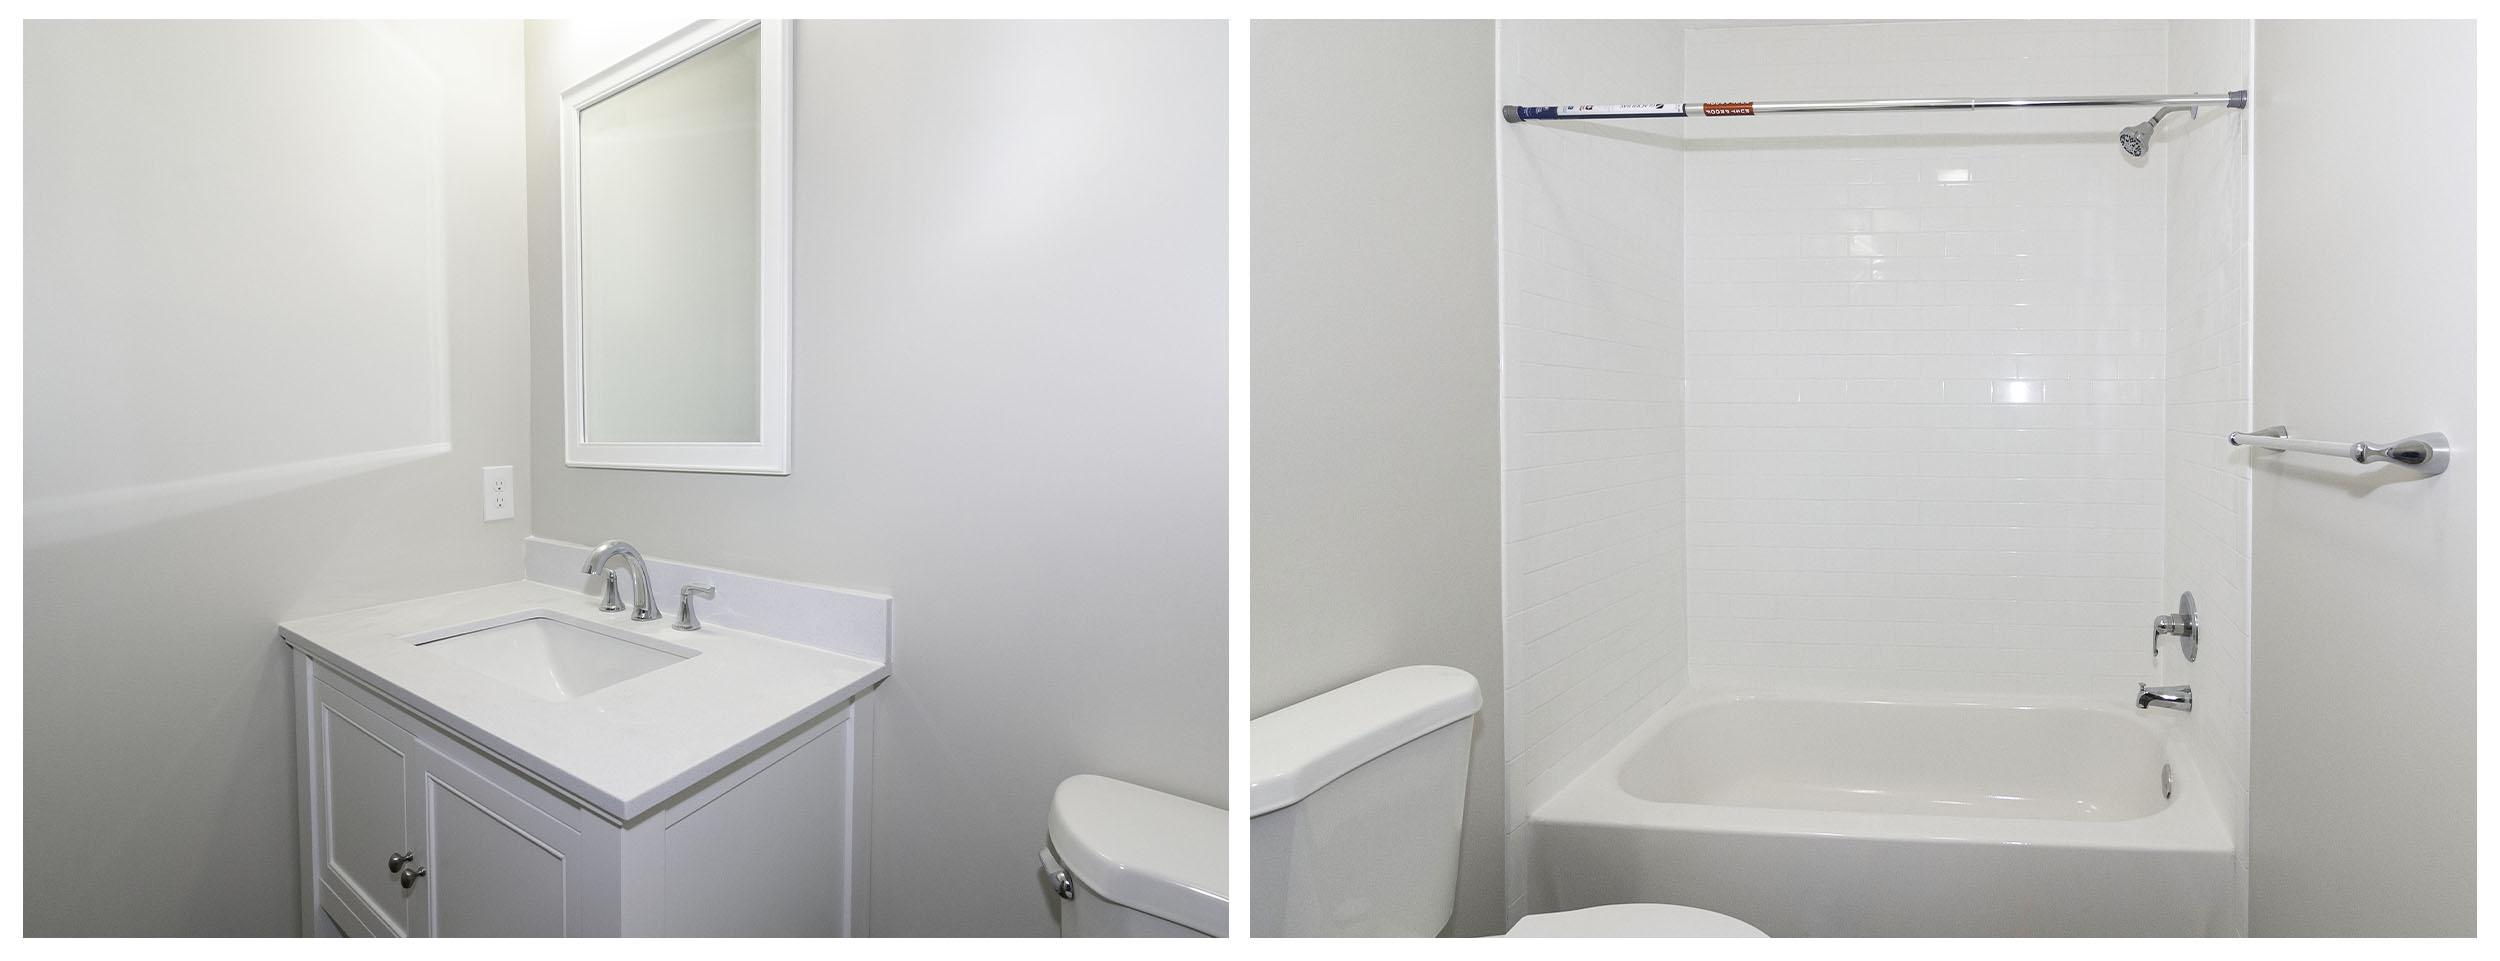 Londontown Master Bathroom comparison resize.jpg